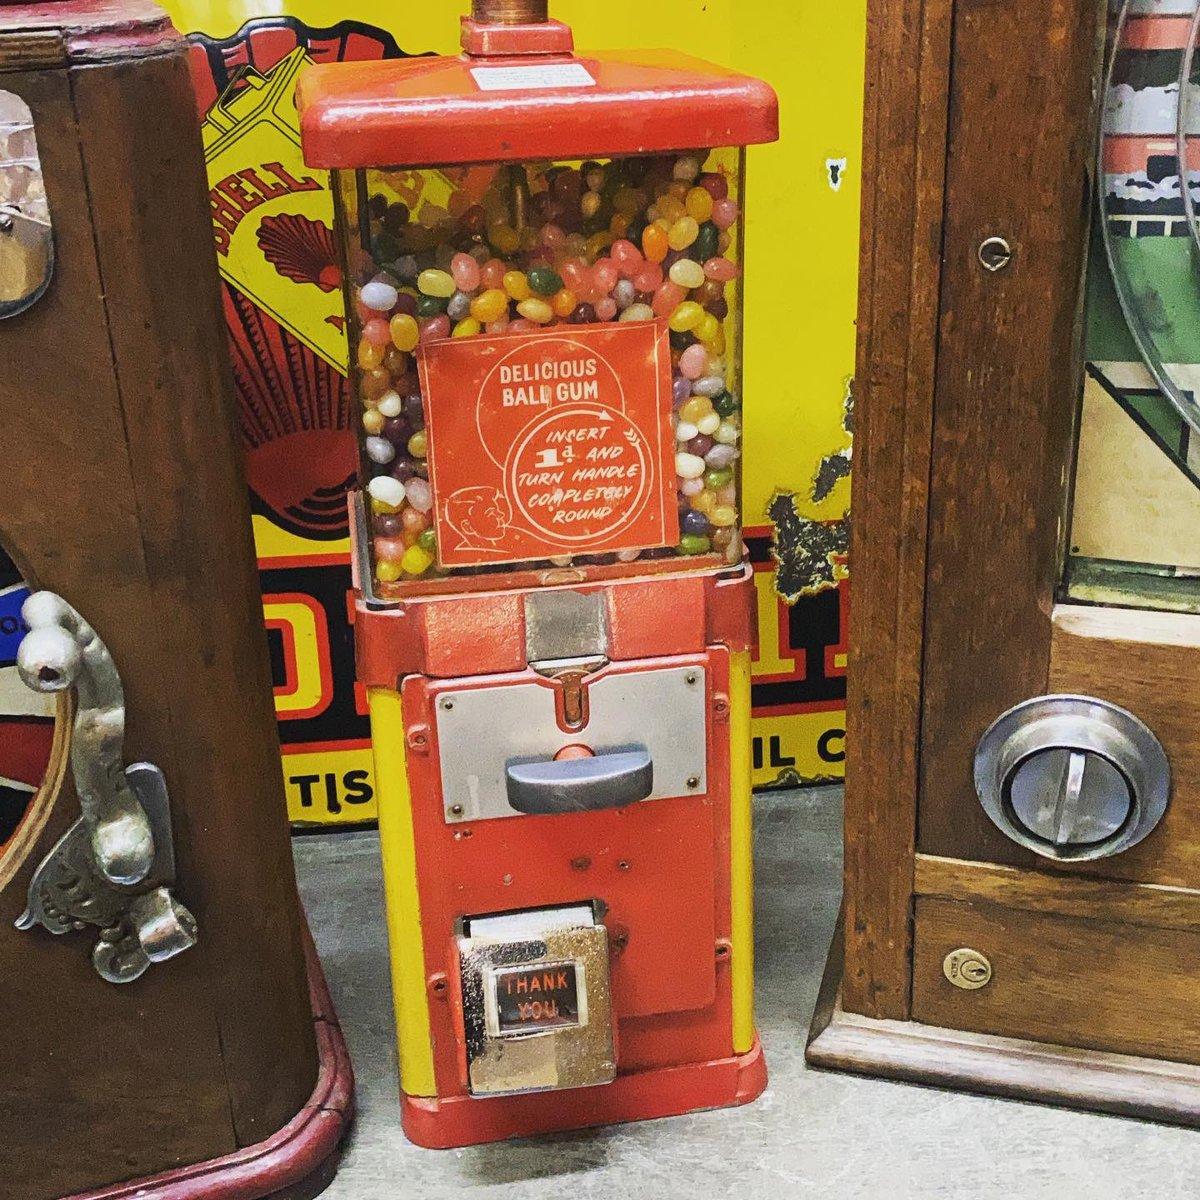 1950's shop bubble gum machine,working order. #1950sshop #vintagebubblegummachine #50s #bubblegum #bubblegummachine #vintageshop #astraantiquescentre #hemswell #lincolnshire https://t.co/lNFhpudDjQ